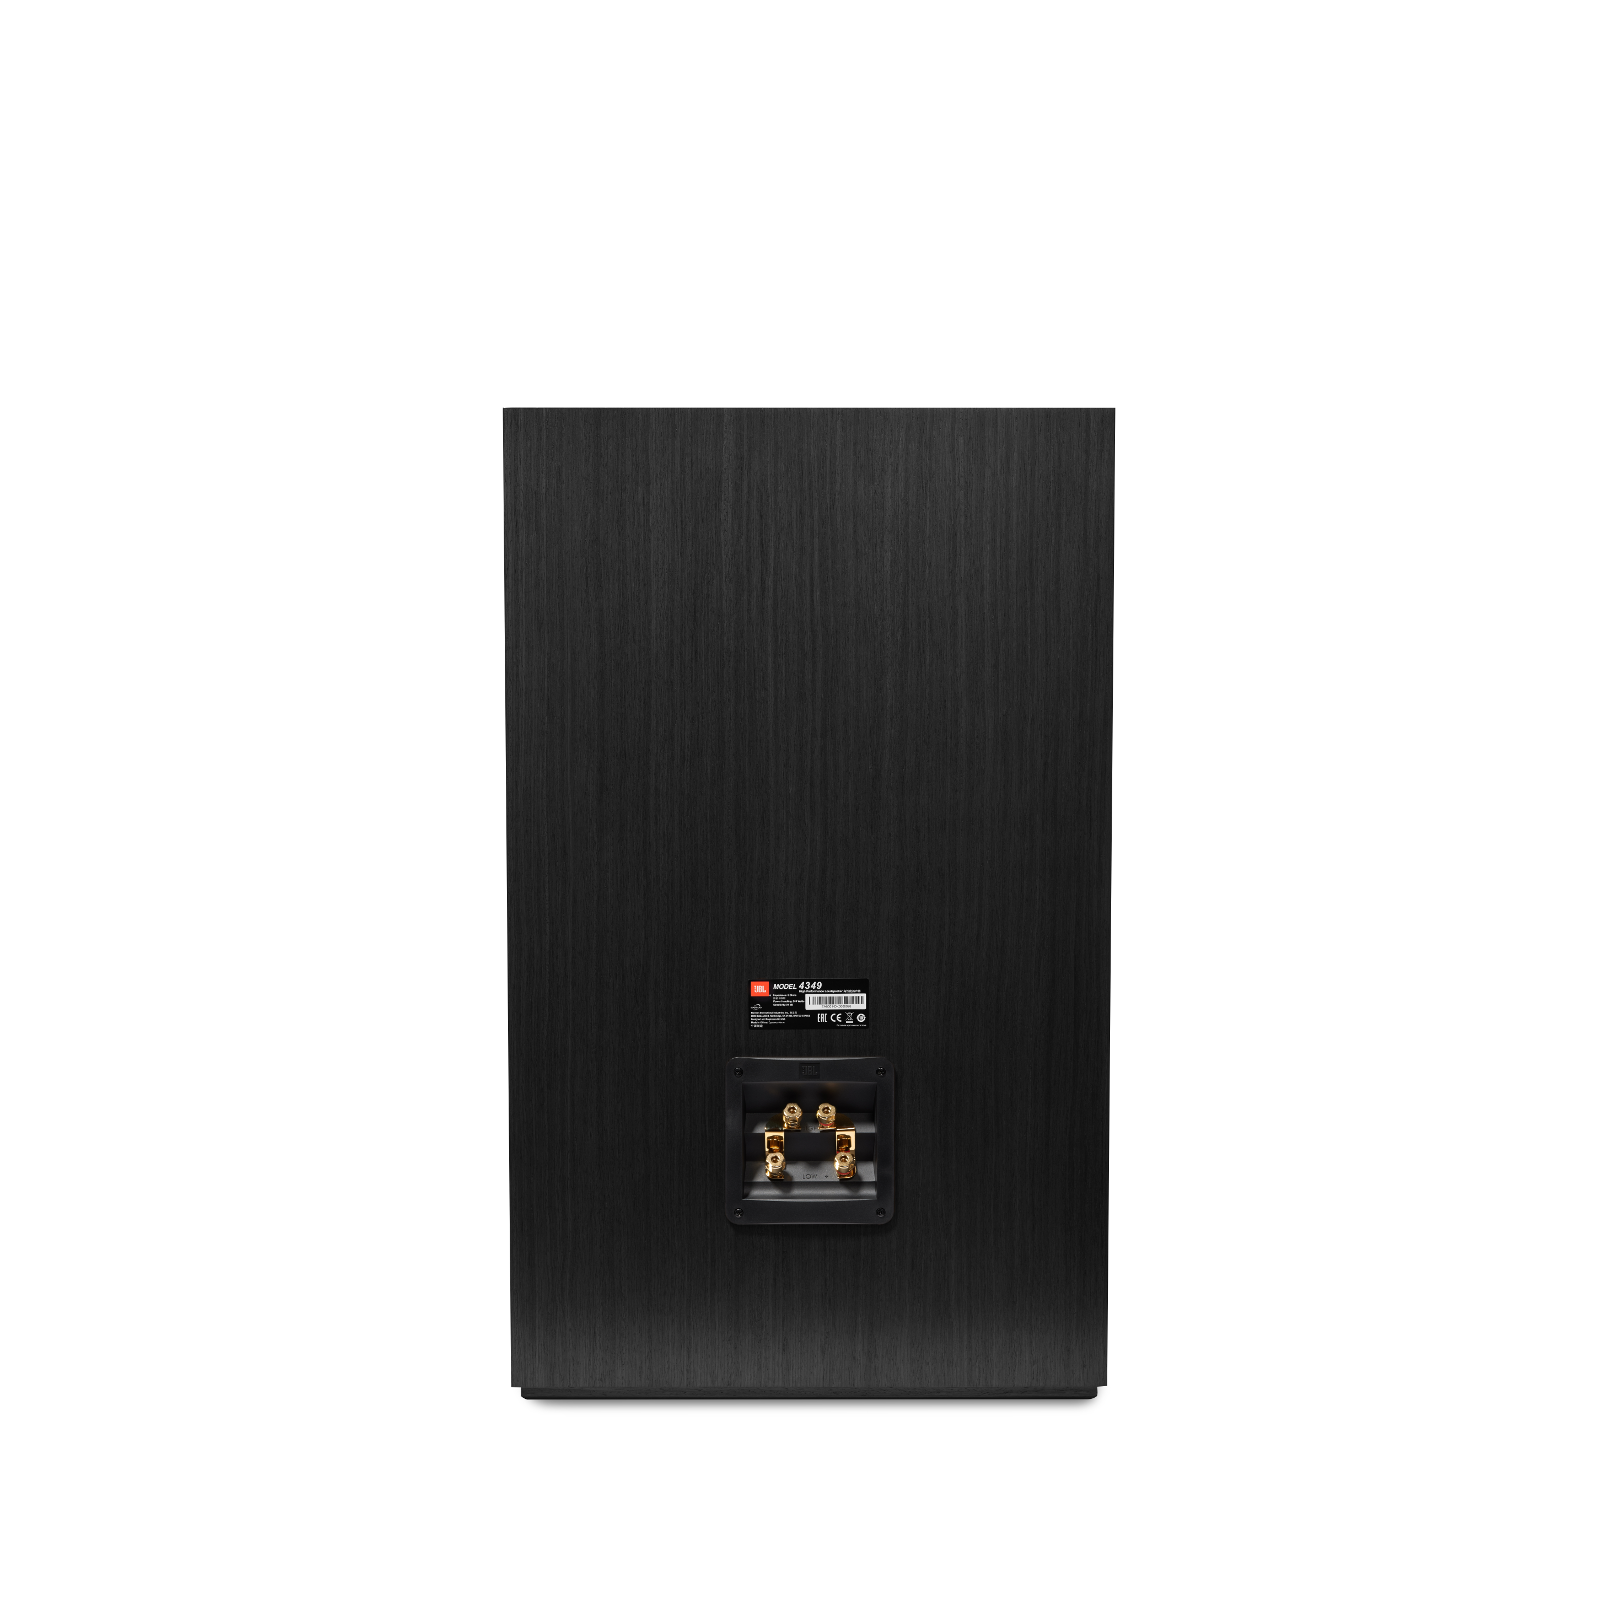 4349 - Black - 12-inch (300mm) 2-way Studio Monitor Loudspeaker - Back